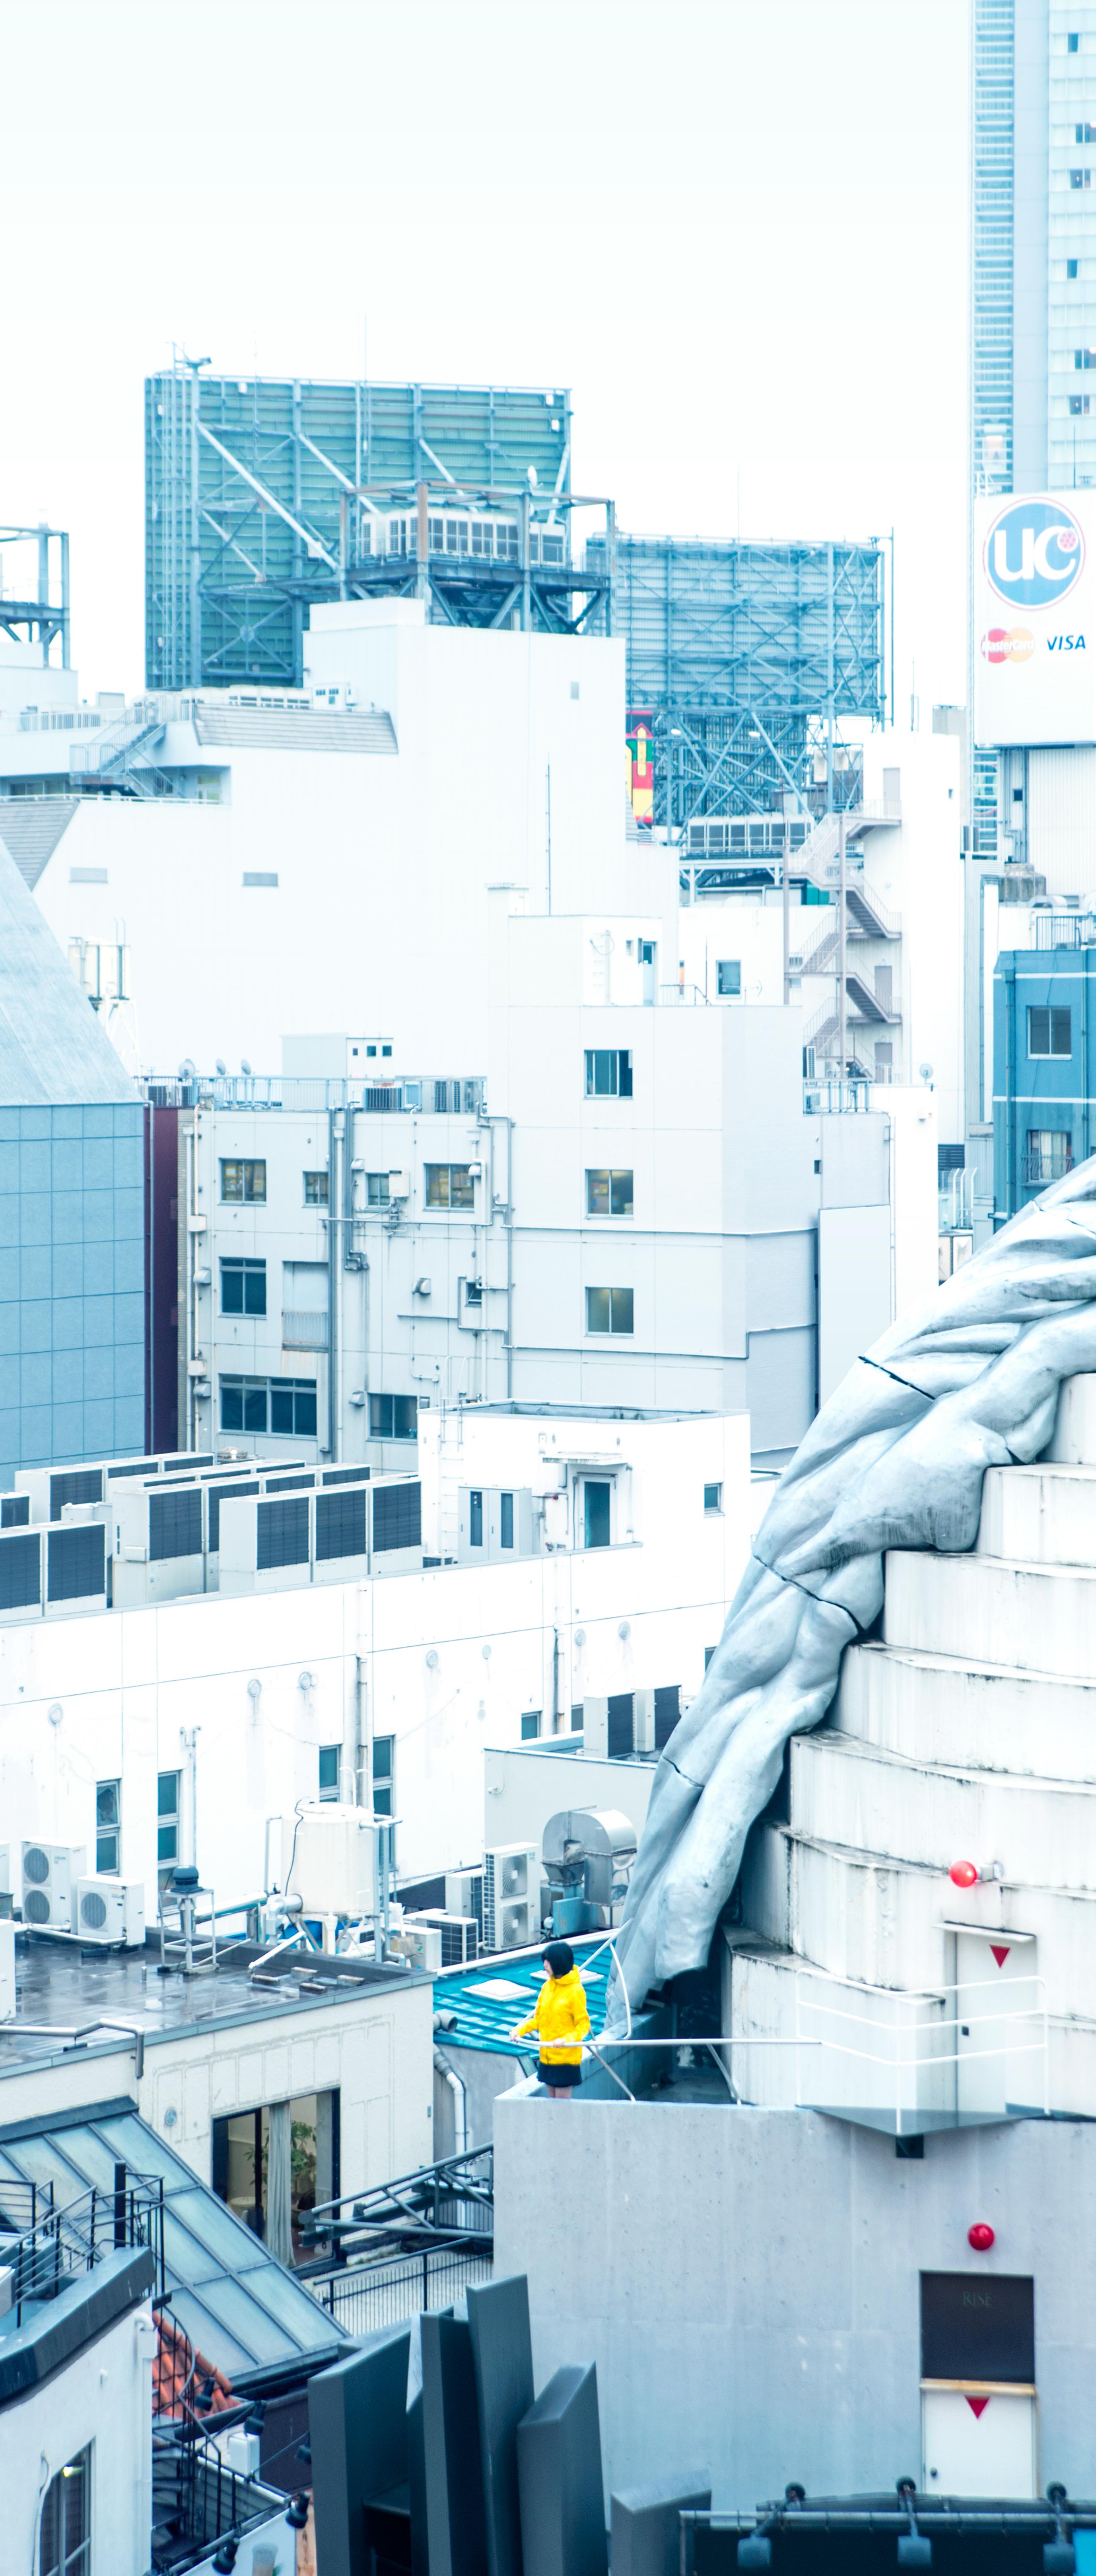 tofubeats、banvox、Seiho、PARKGOLFら出演!渋谷WWW/WWW Xにてマルチネイベント開催 daitokai_0822_fix